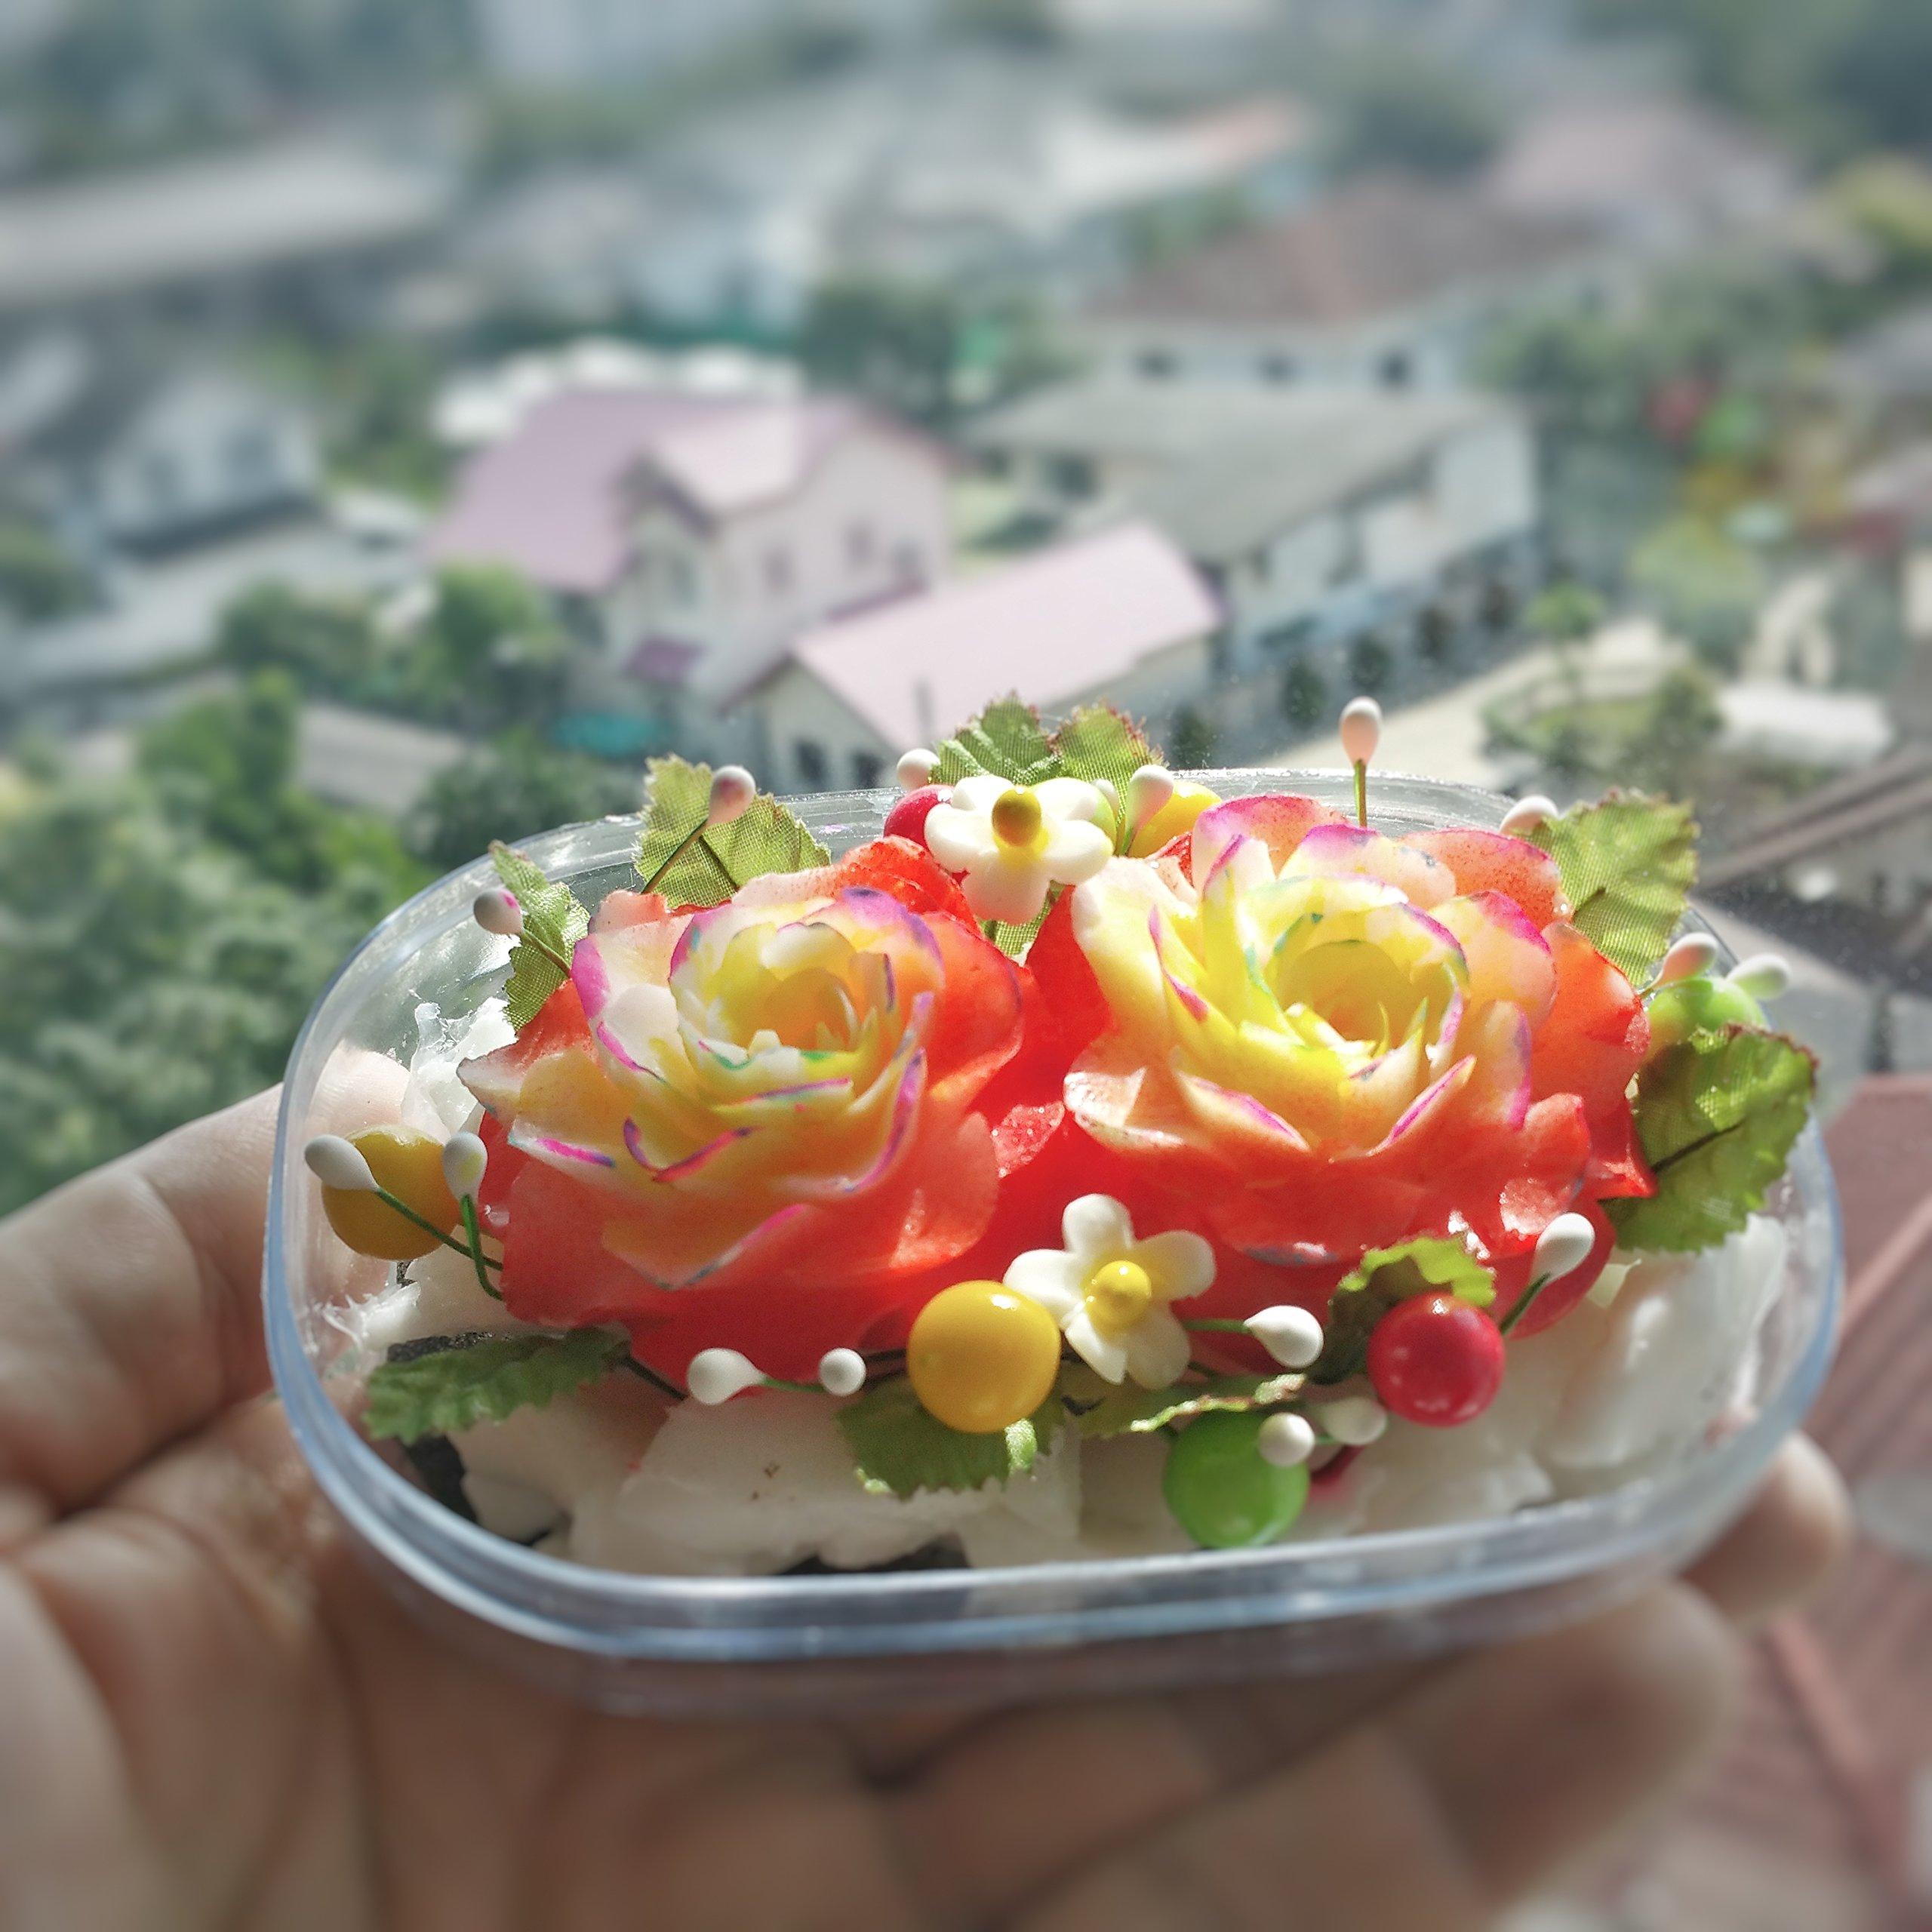 Orange Festive Flowers Hand Carved Soap Bar, Jasmine Aroma Essential Oil, Handmade Decorative Soap Carving for Home by Thai Artisan